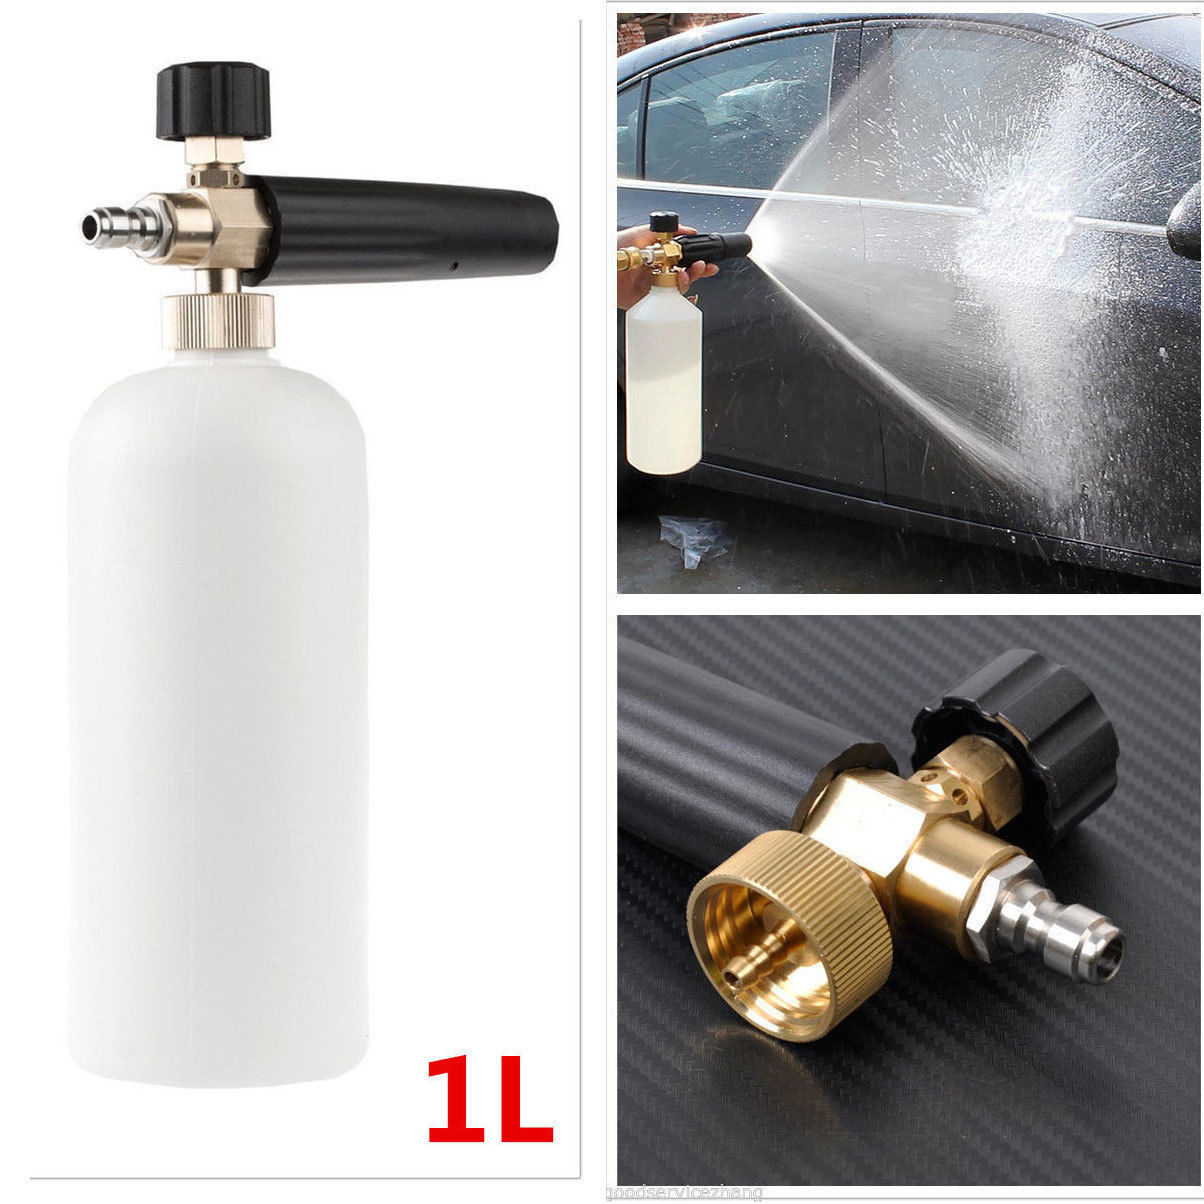 1L Adjustable Snow Foam Lance Washer Car Wash Gun Soap Pressure Washer Bottle